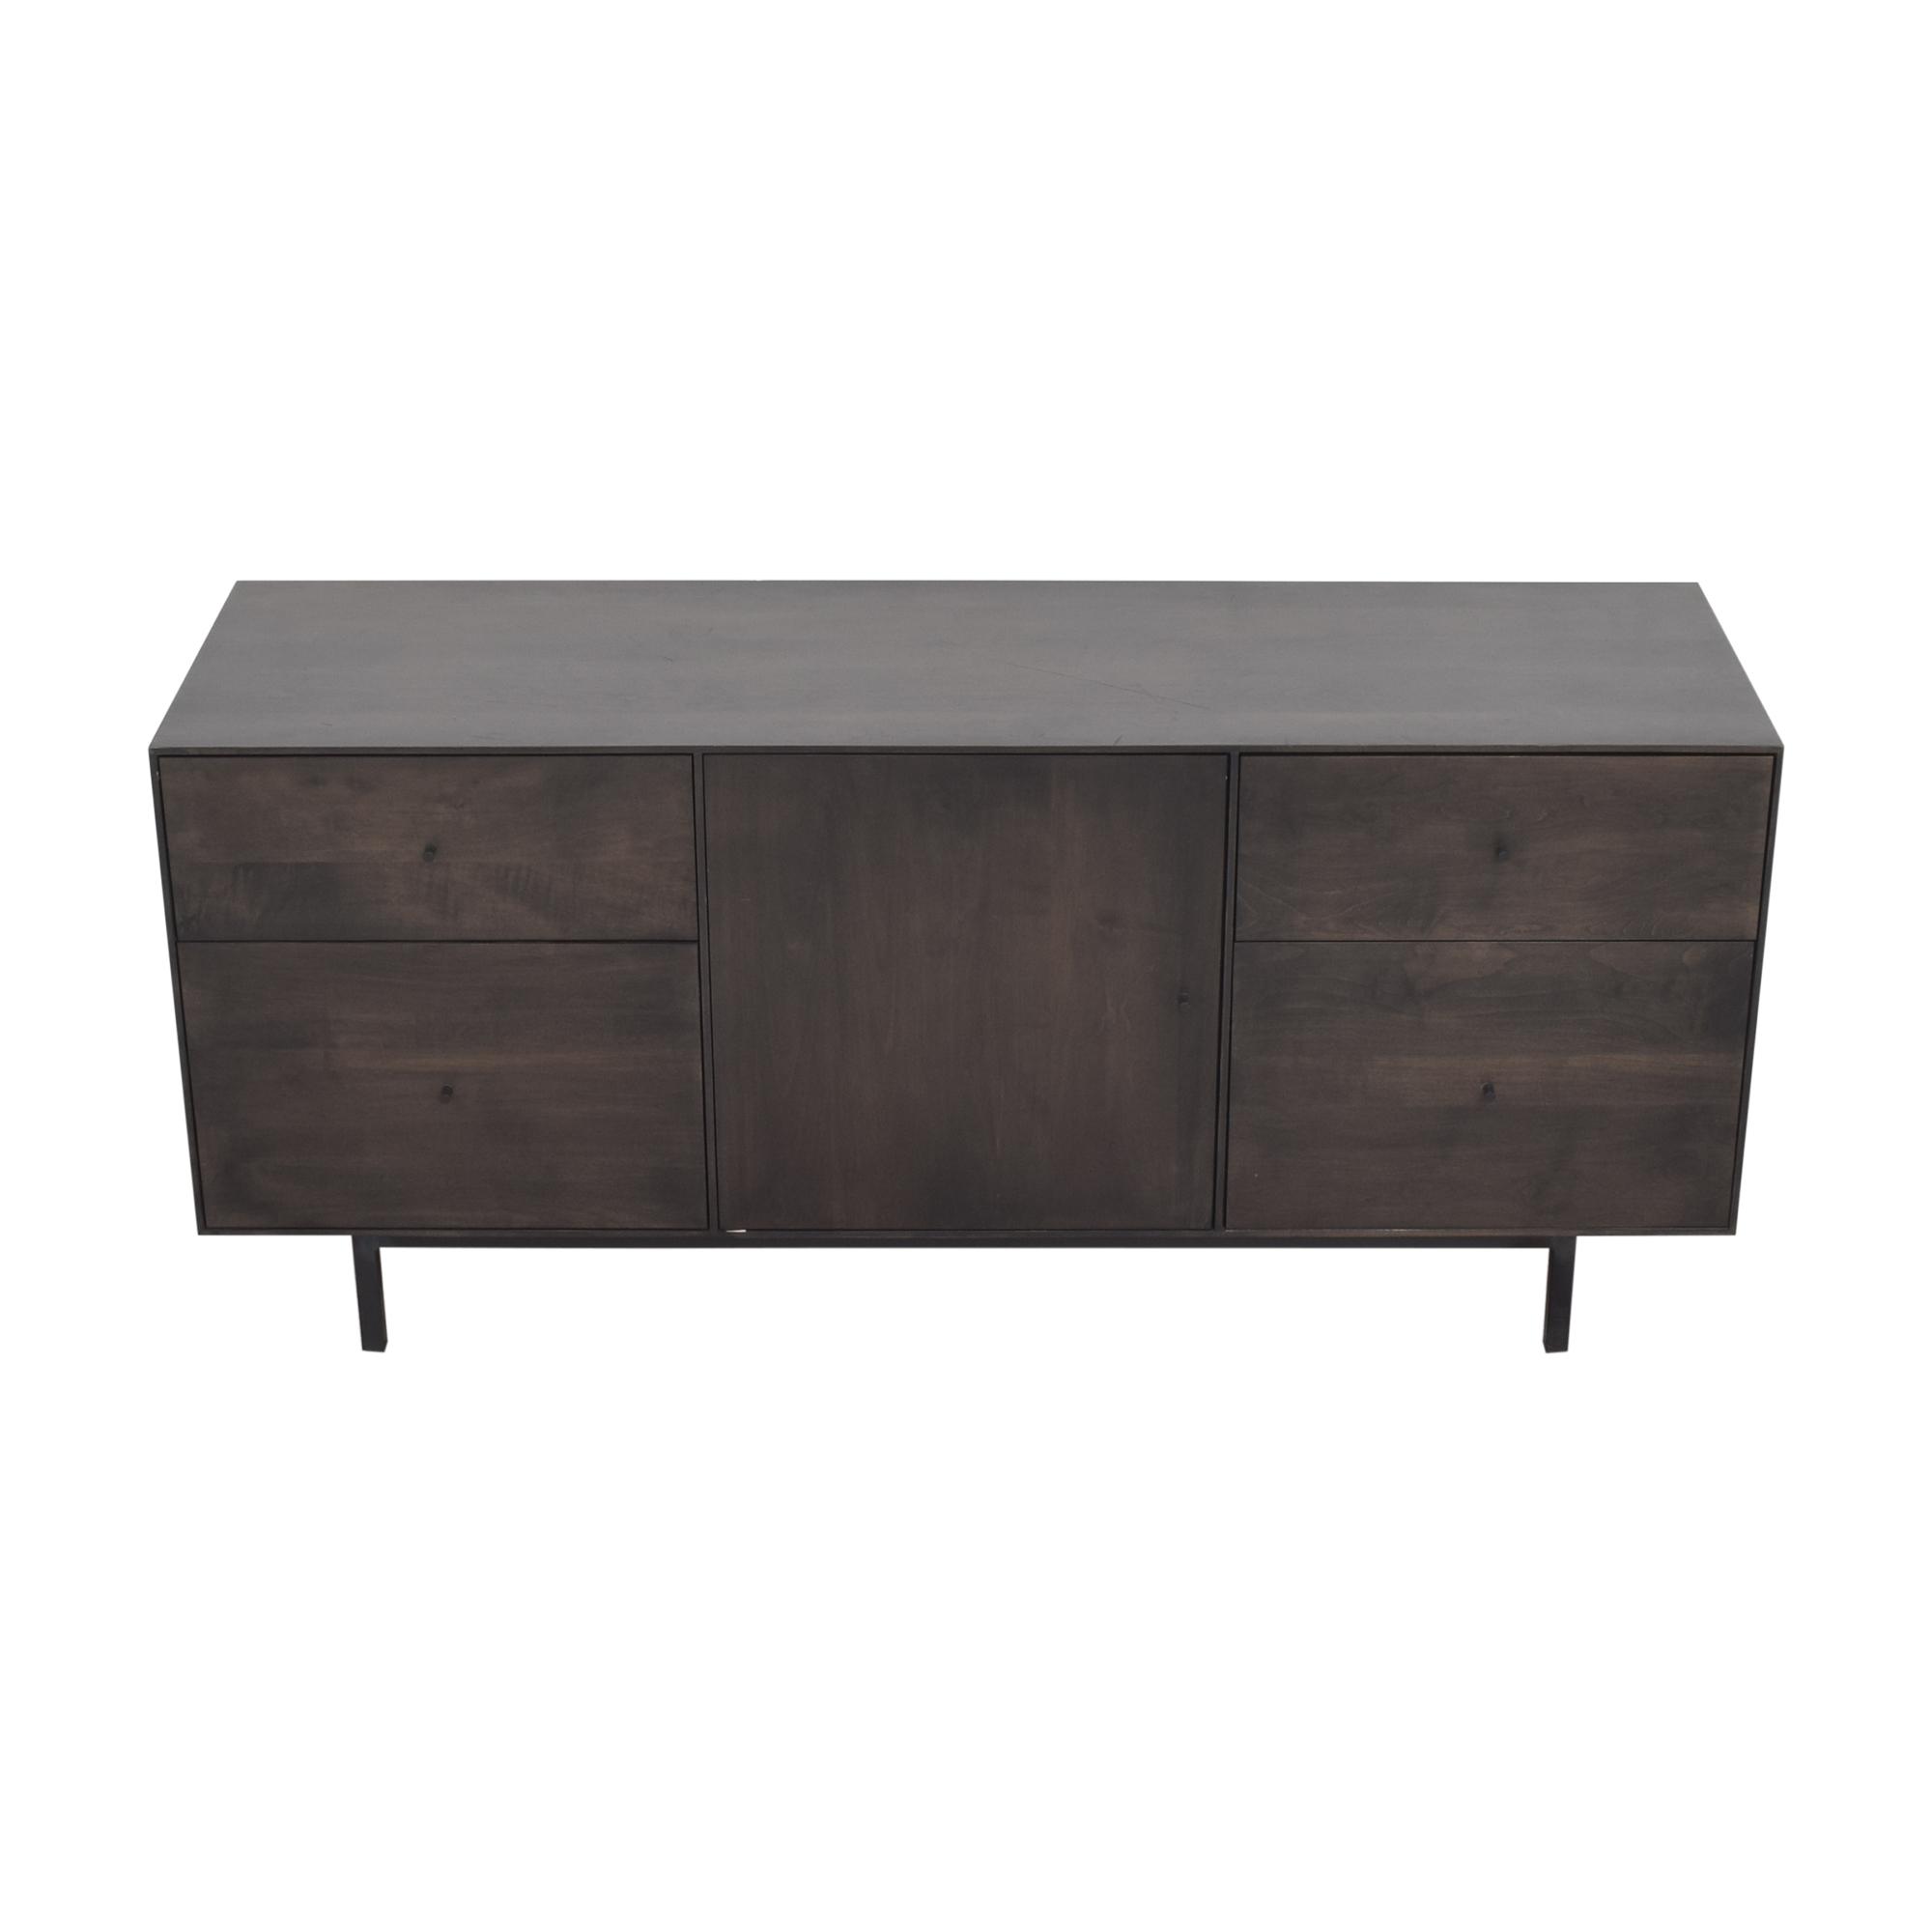 Room & Board Hudson Custom Cabinet / Cabinets & Sideboards